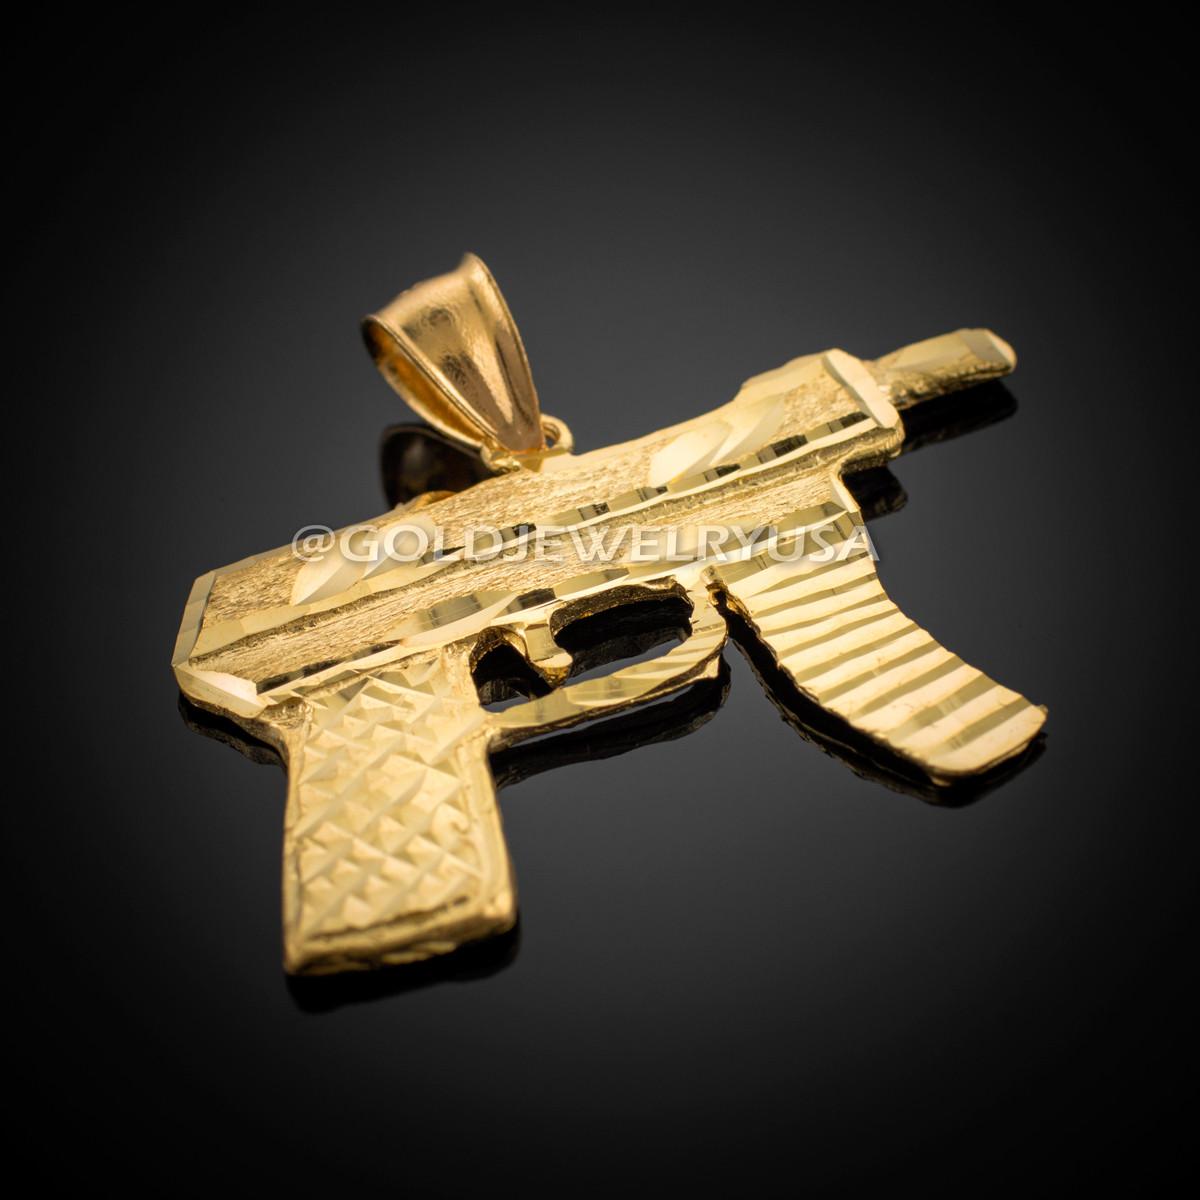 gold machine gun pistol diamondcut pendant